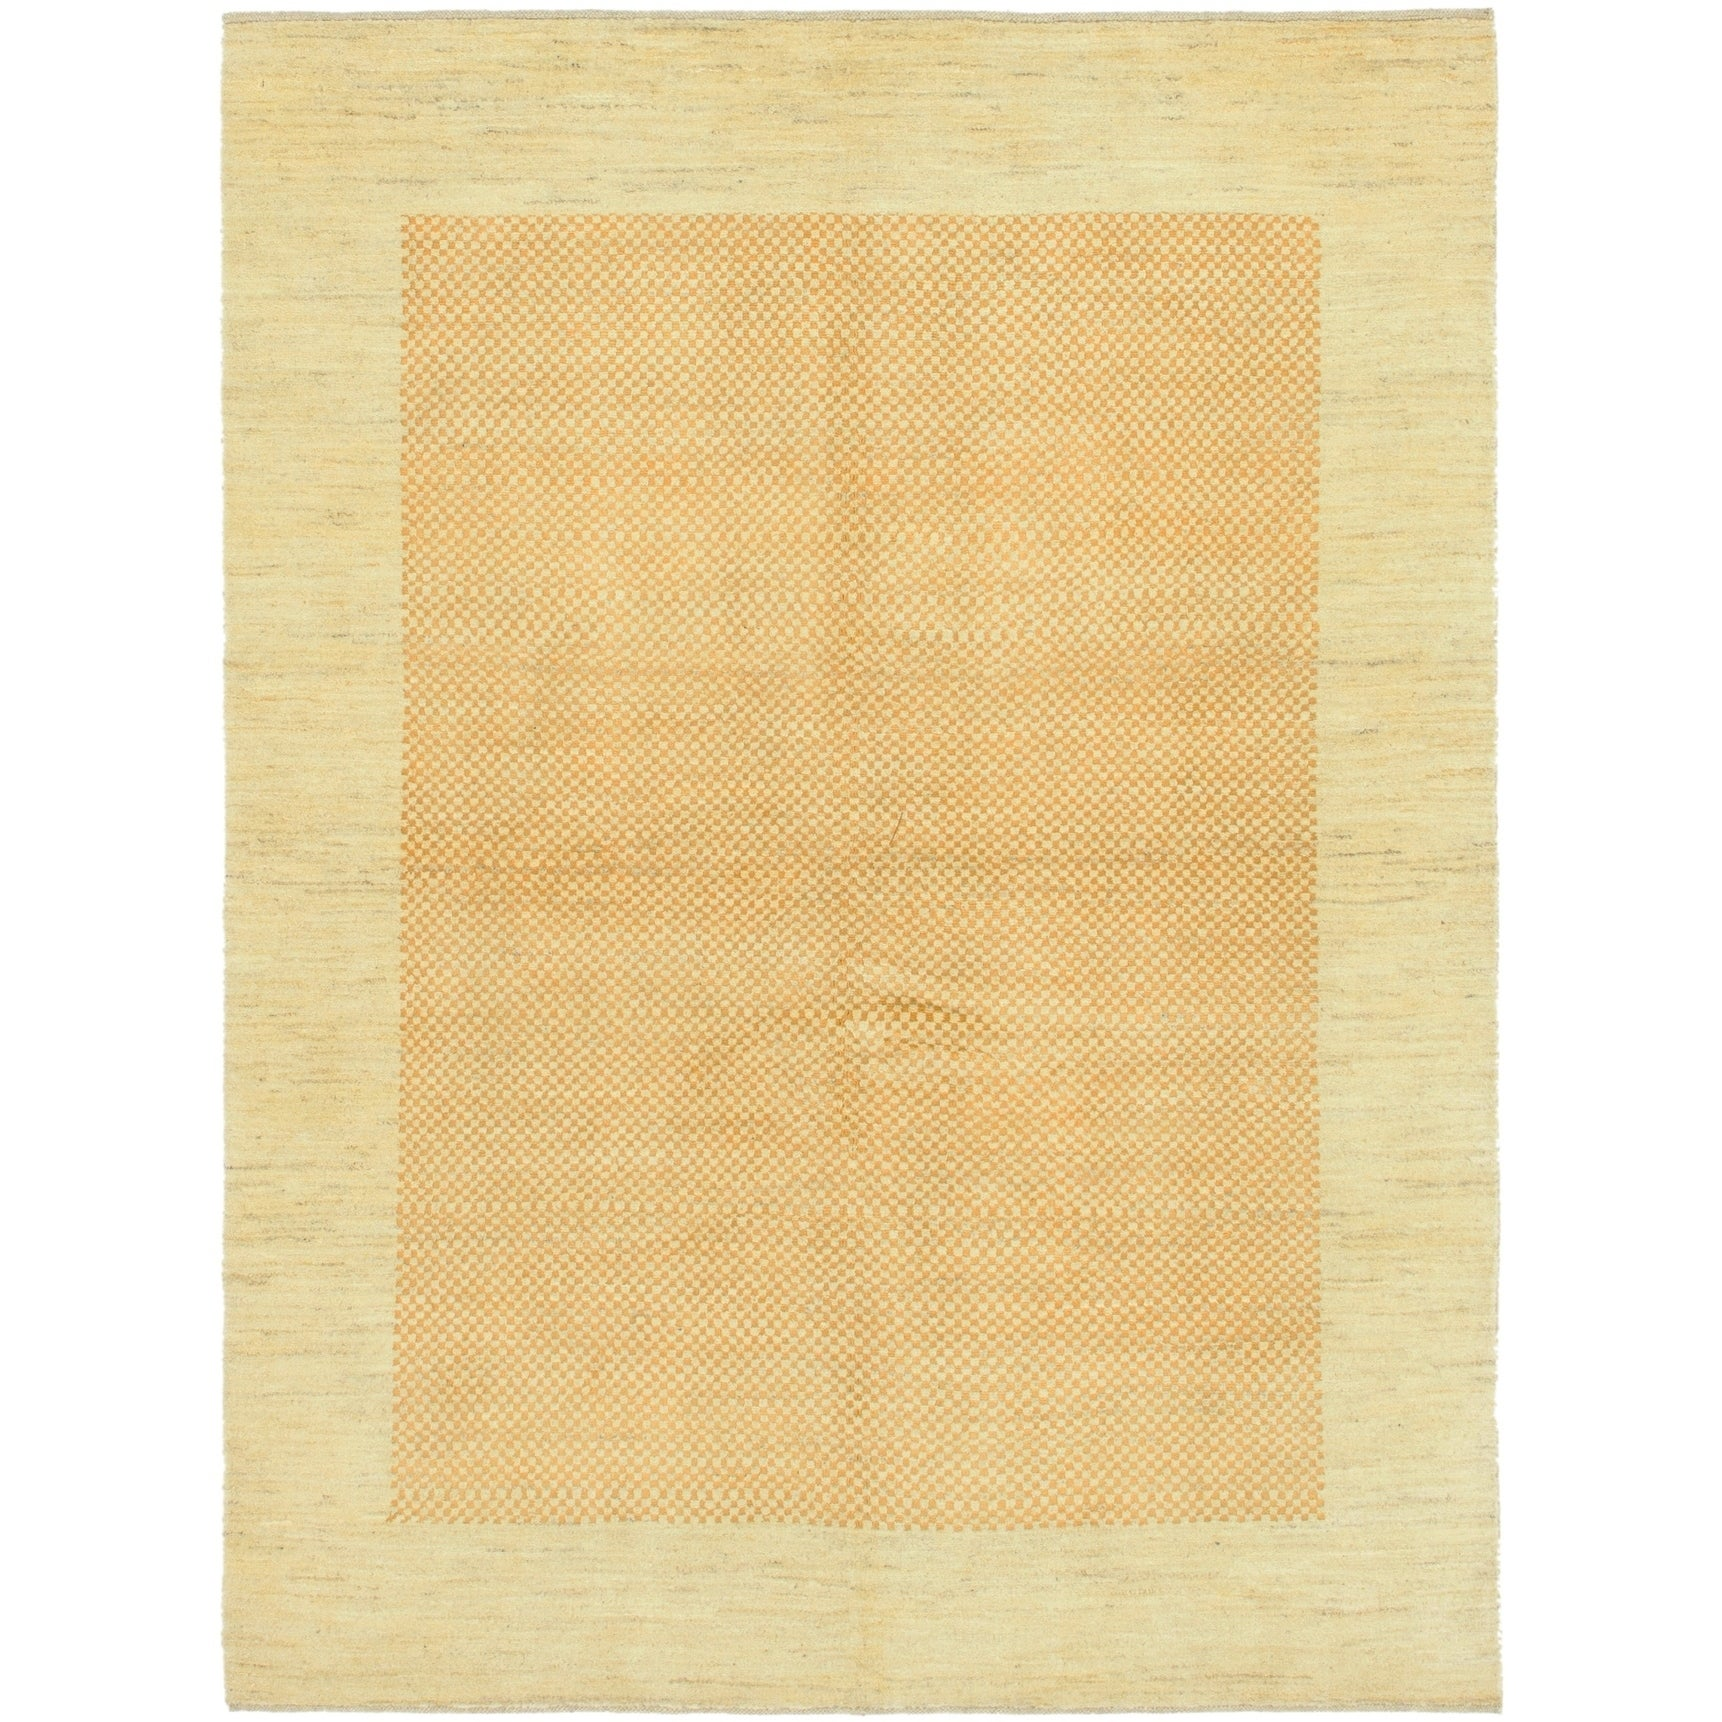 Hand Knotted Kashkuli Gabbeh Wool Area Rug - 5 x 6 8 (Gold - 5 x 6 8)